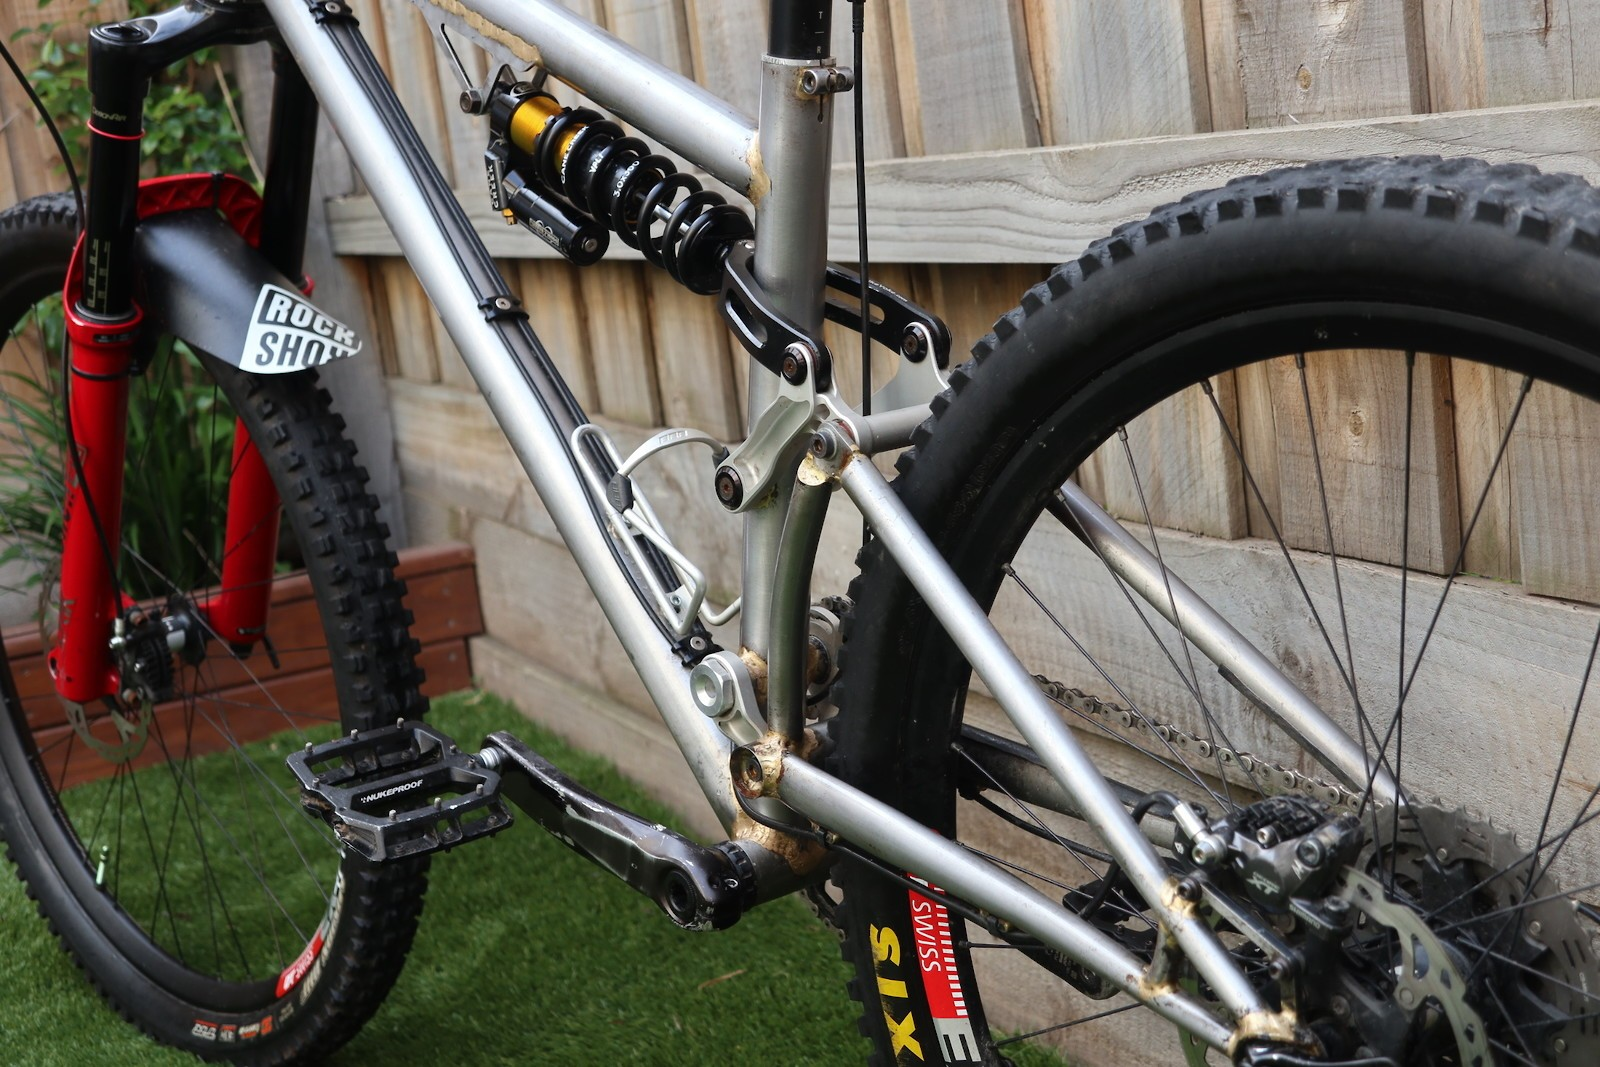 Homemade High-Pivot Enduro Bike by Ctuck - Incredible DIY Mountain Bikes - Mountain Biking Pictures - Vital MTB